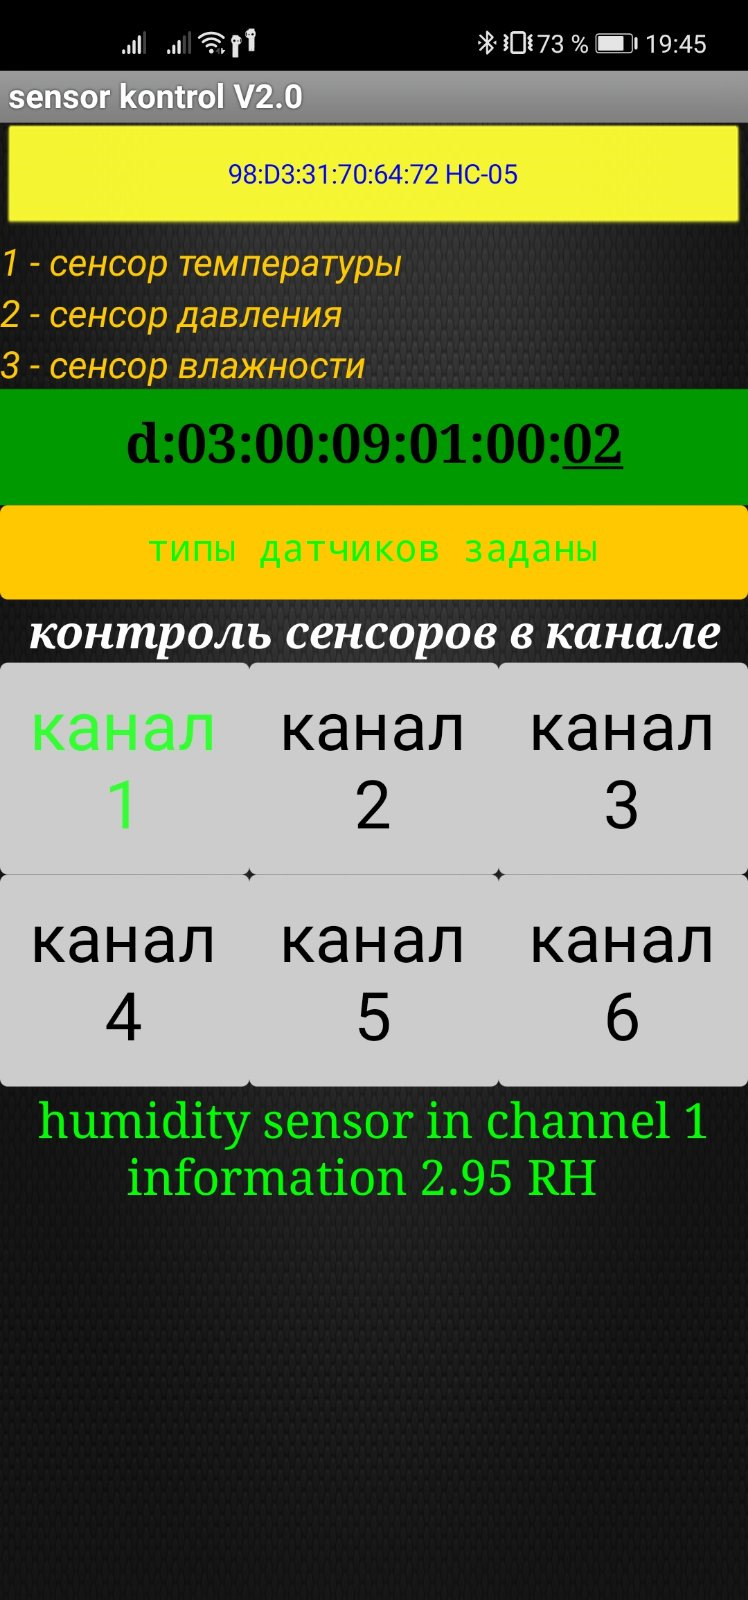 Q7Xk0uLpuAYdn-vxAIuFdRw-UOE-960.jpg